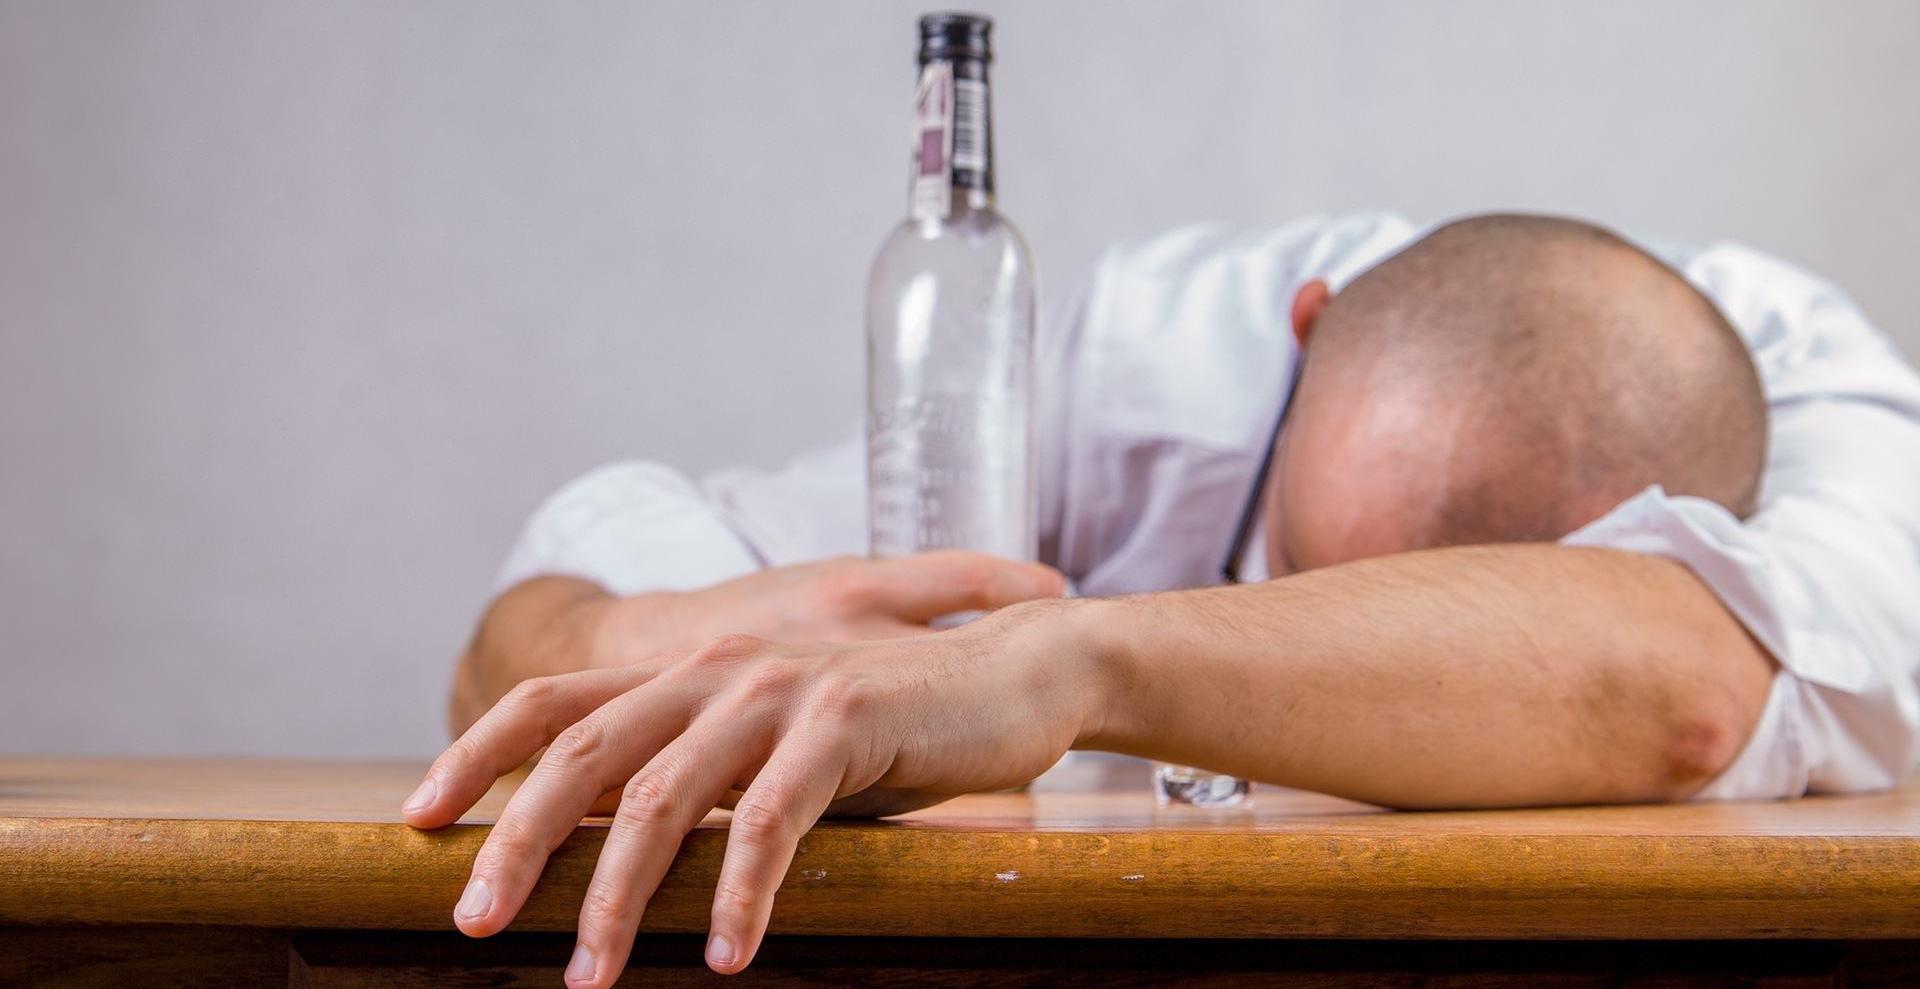 alcohol-hangover-crop